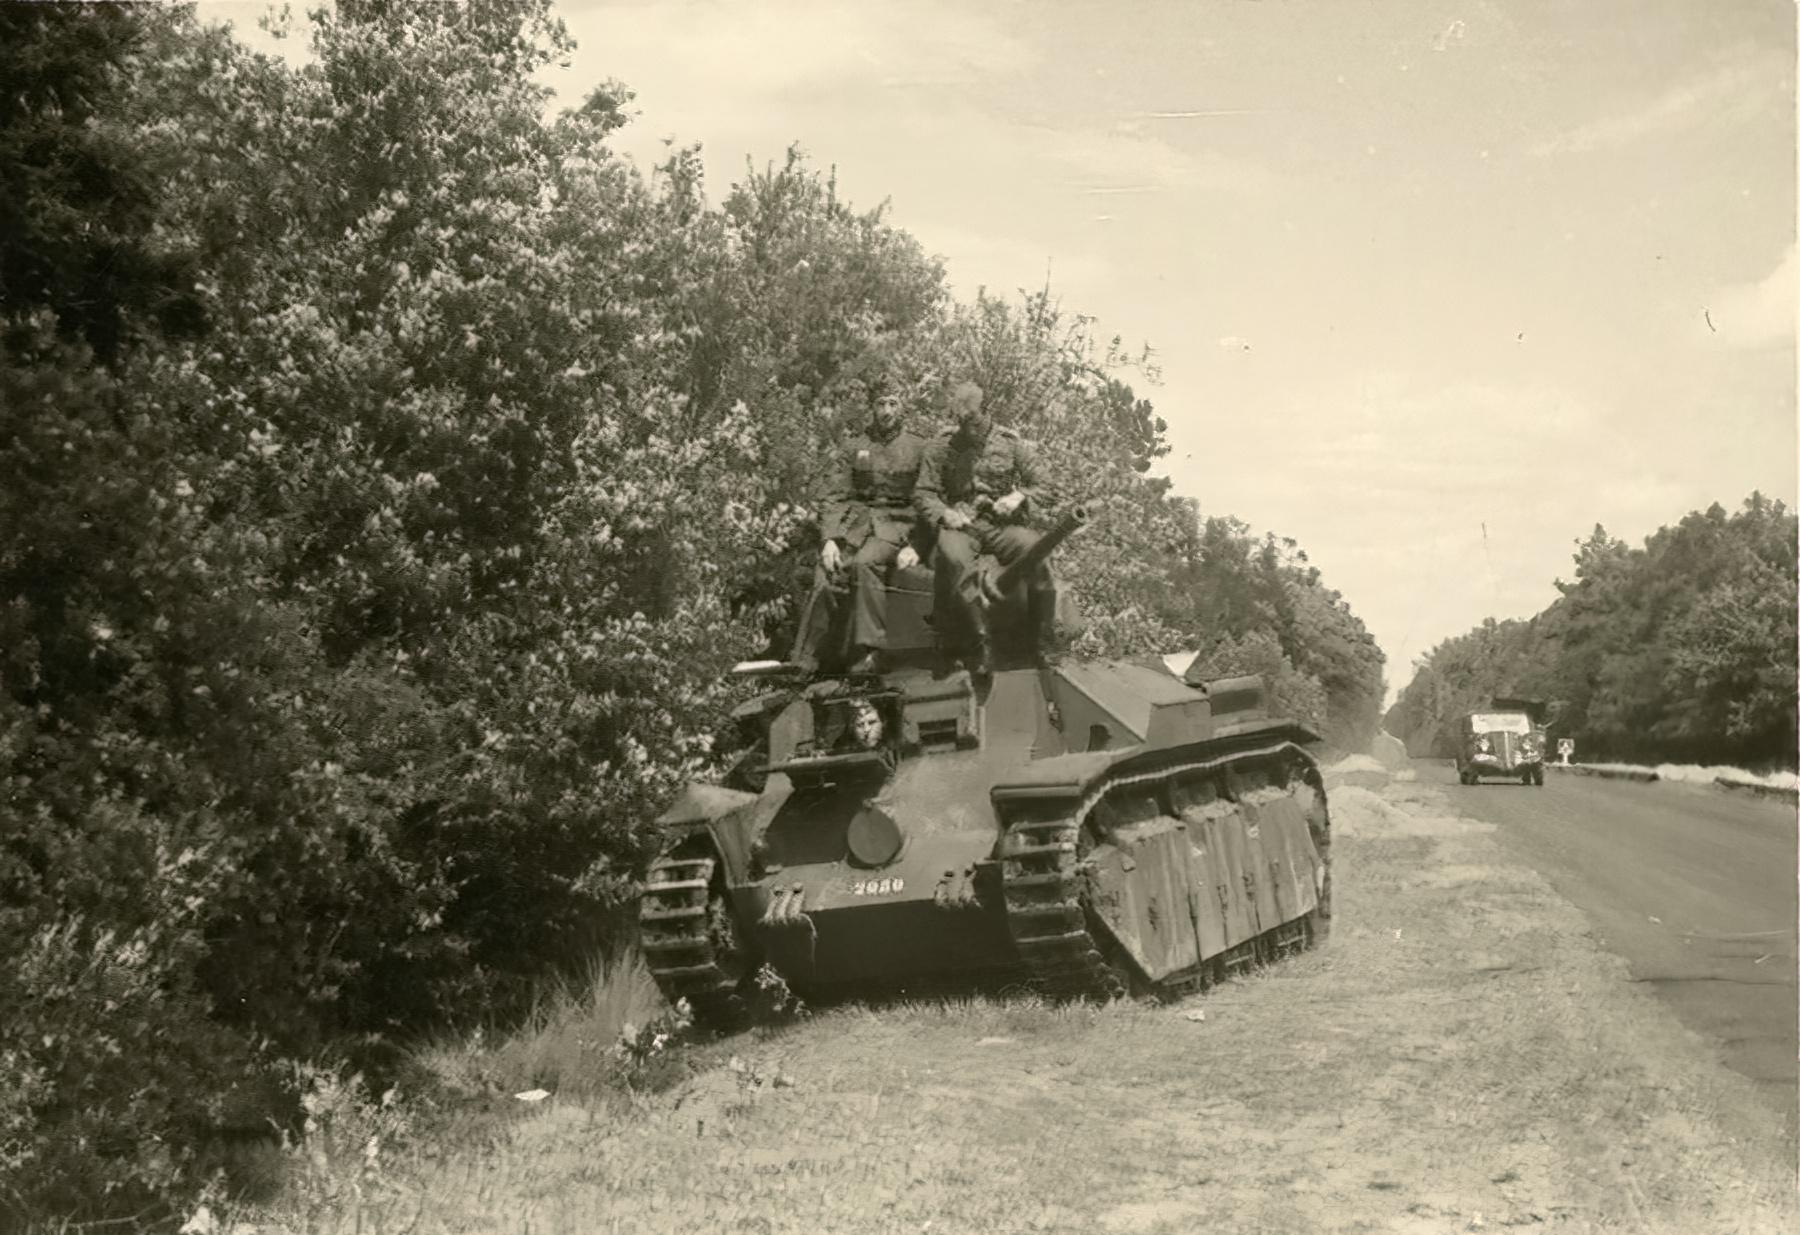 French Army Somua S35 sits abandoned along a roadside France June 1940 ebay 01